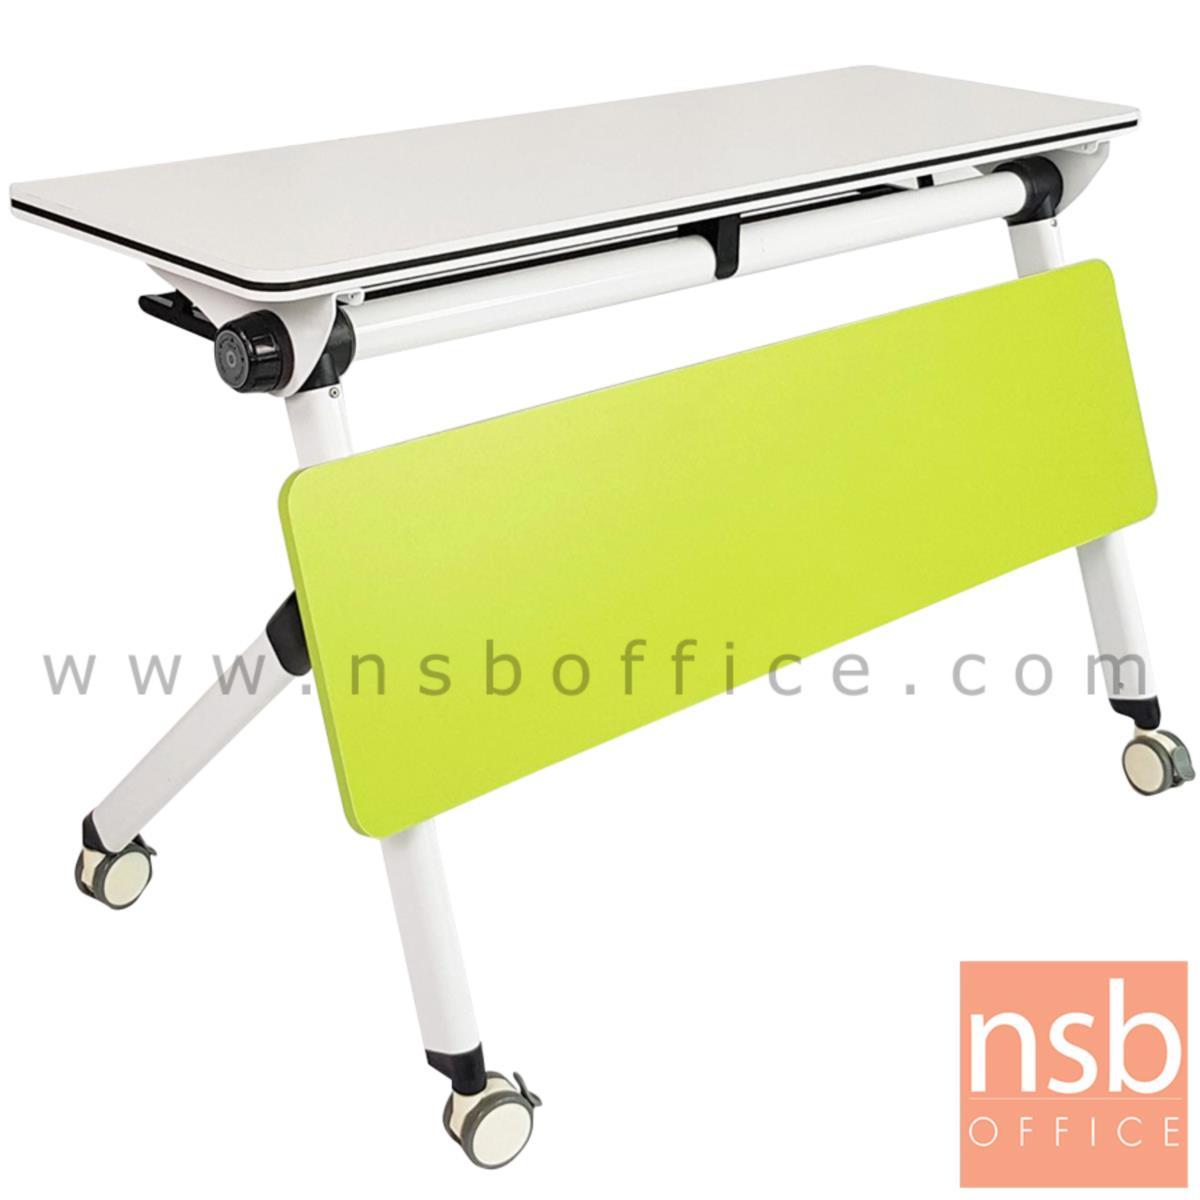 A10A084:โต๊ะสัมมนาเล็ก มีบังตา พับได้ล้อเลื่อน รุ่น BRINE ขนาด 120W*40D cm.